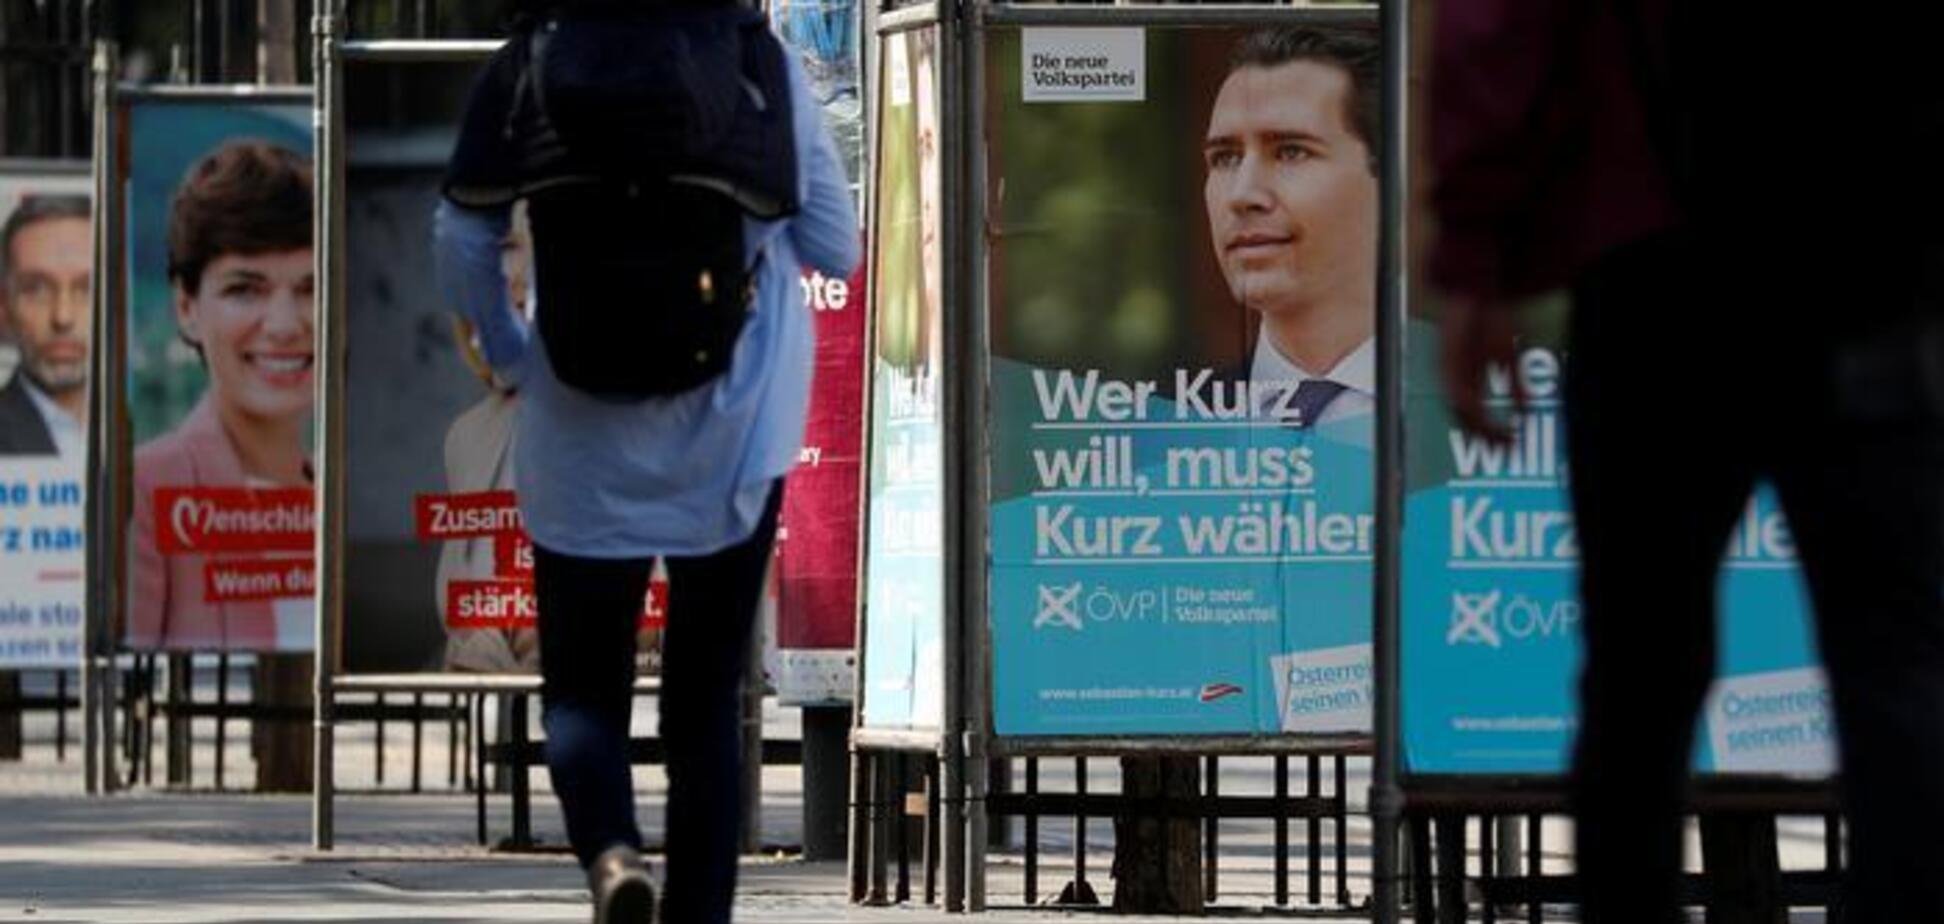 Друг Путина побеждает на выборах в Австрии после скандала с РФ